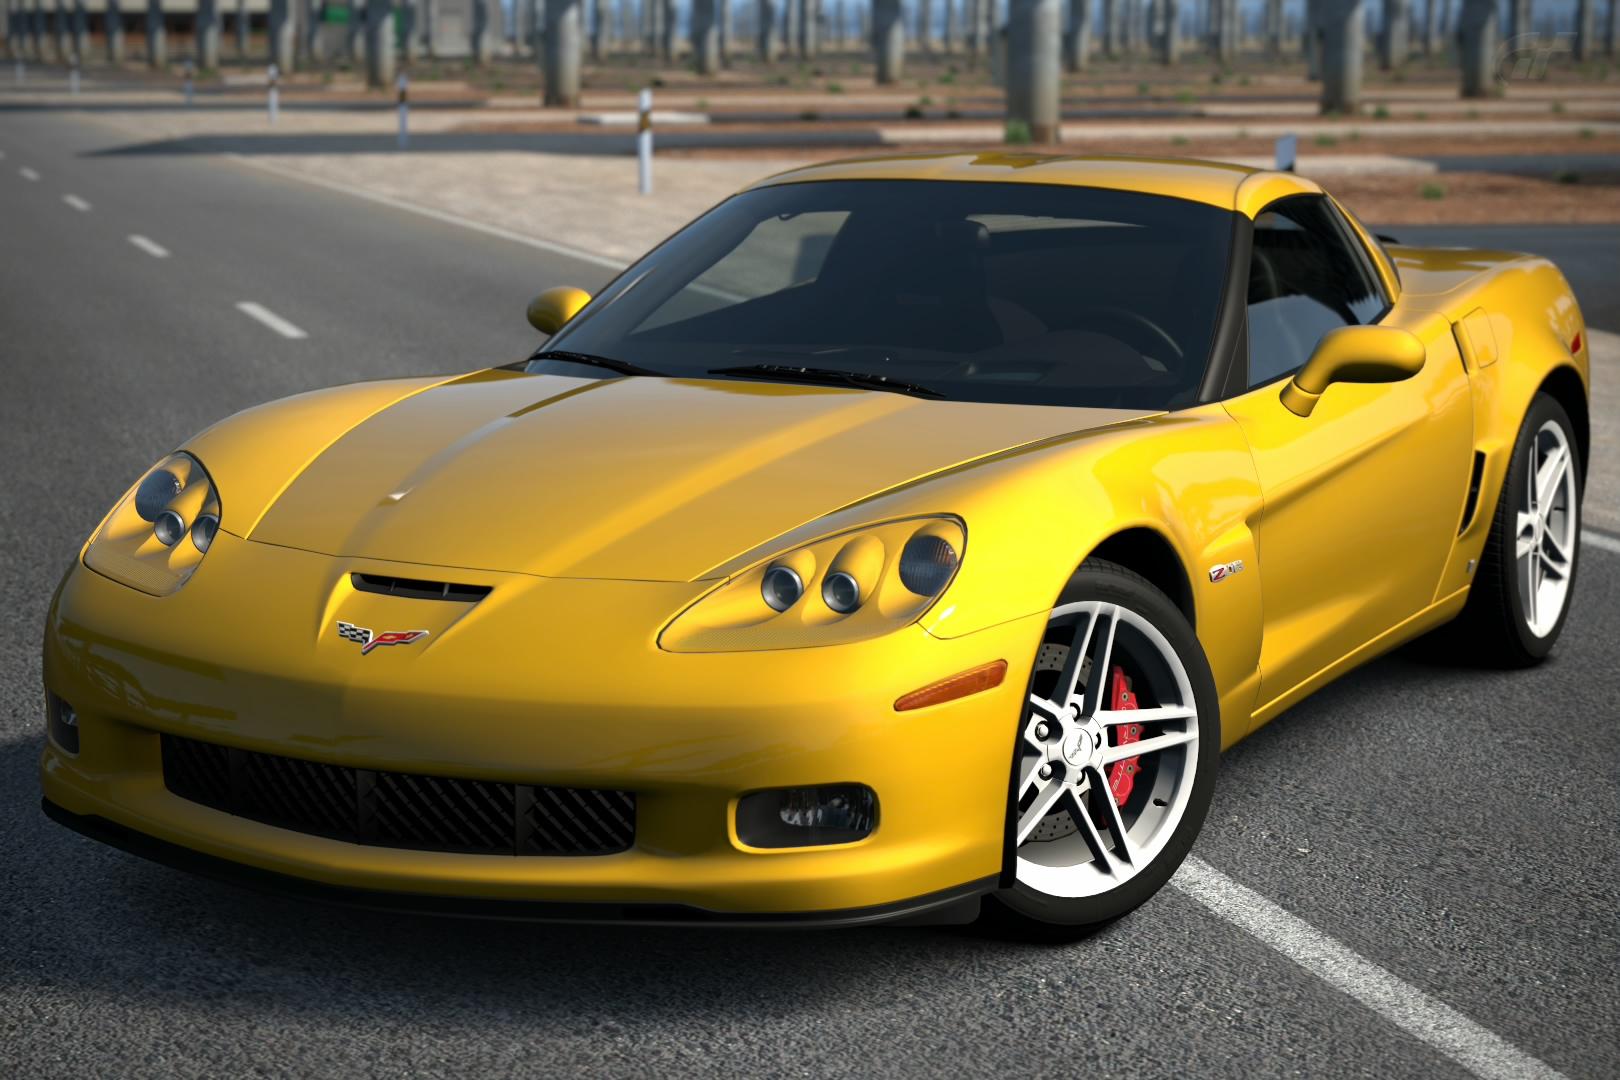 Kelebihan Kekurangan Chevrolet Corvette C6 Tangguh